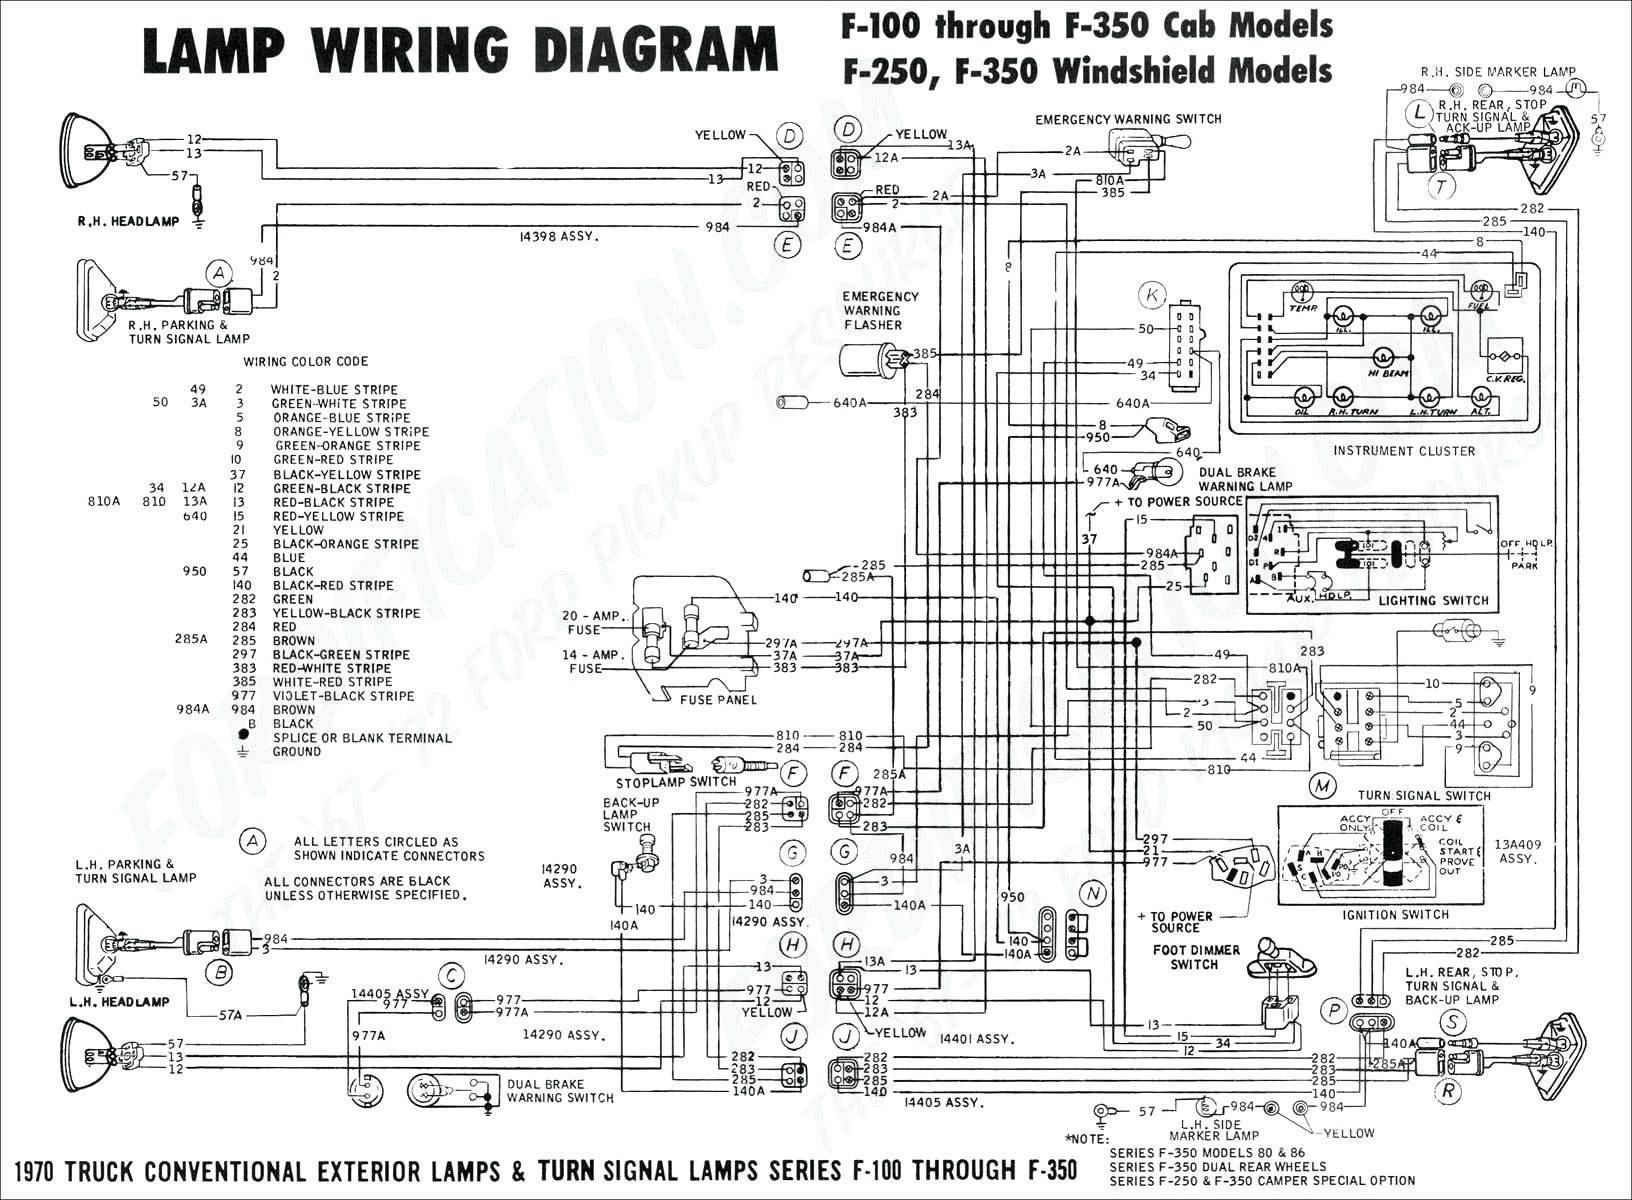 Audi A4 Brake Light Wiring Diagram Best 2002 Ford F 250 Super Duty Cool F250 Trailer